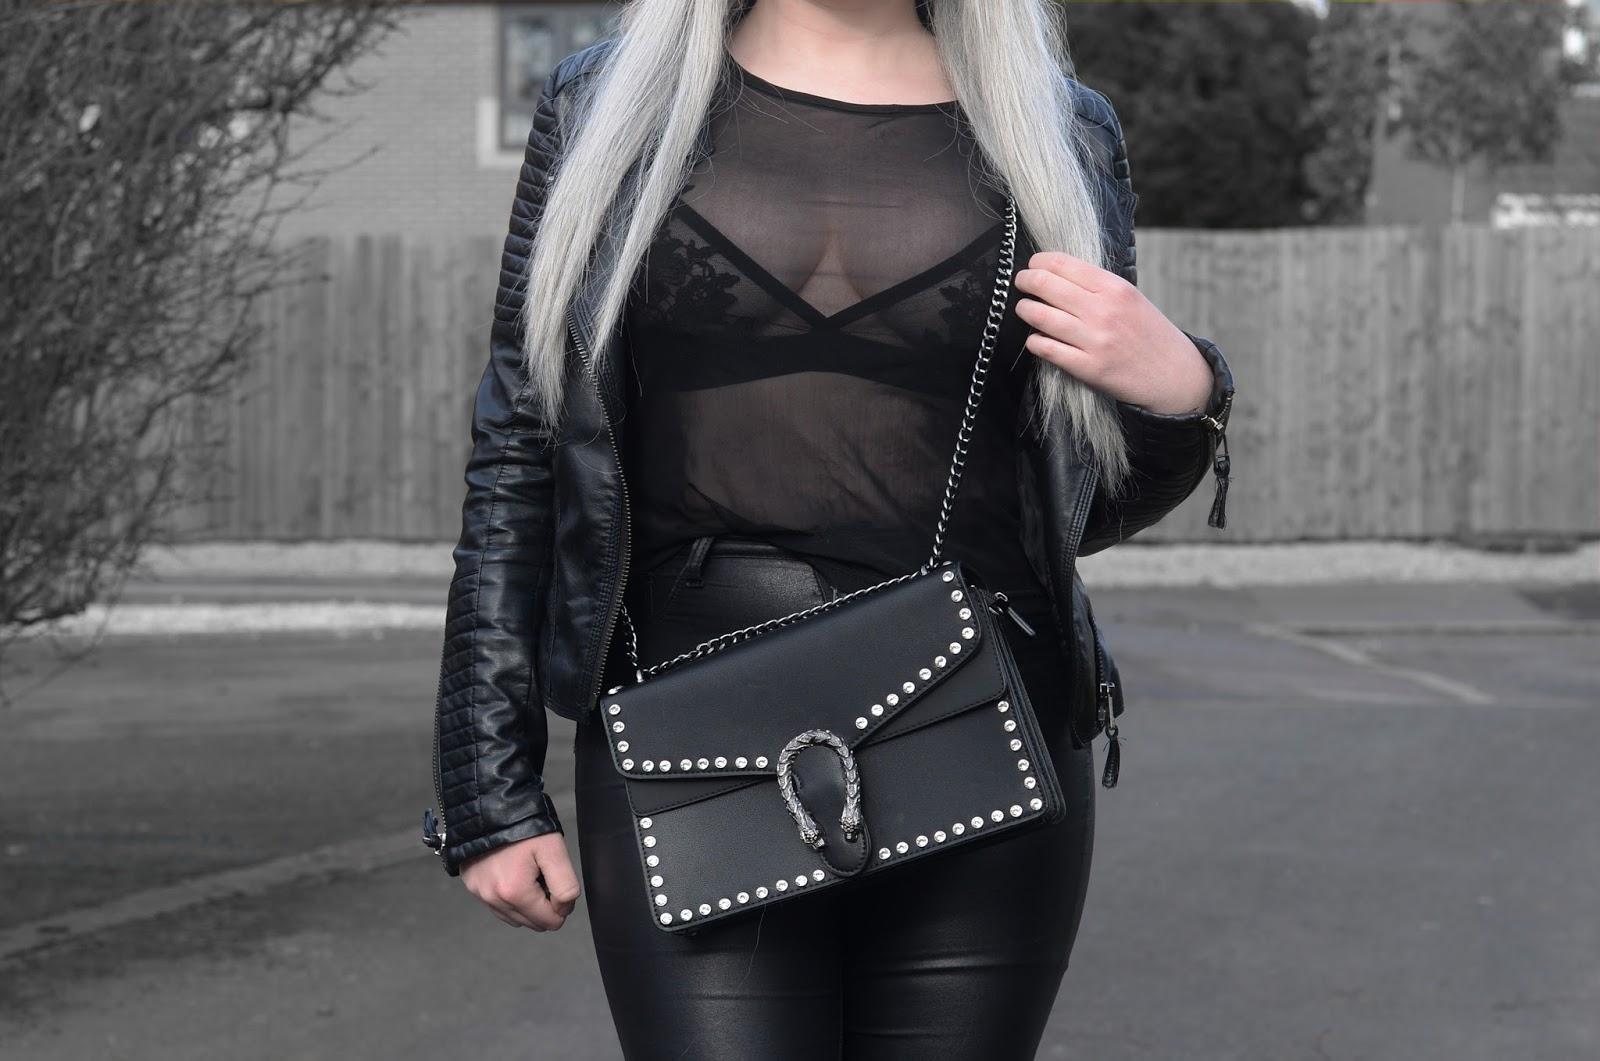 fd6eba95da Sammi Jackson - Primark Fedora / Zaful Sunglasses / Shein Biker Jacket /  Primark Bralet /. Another all black ...